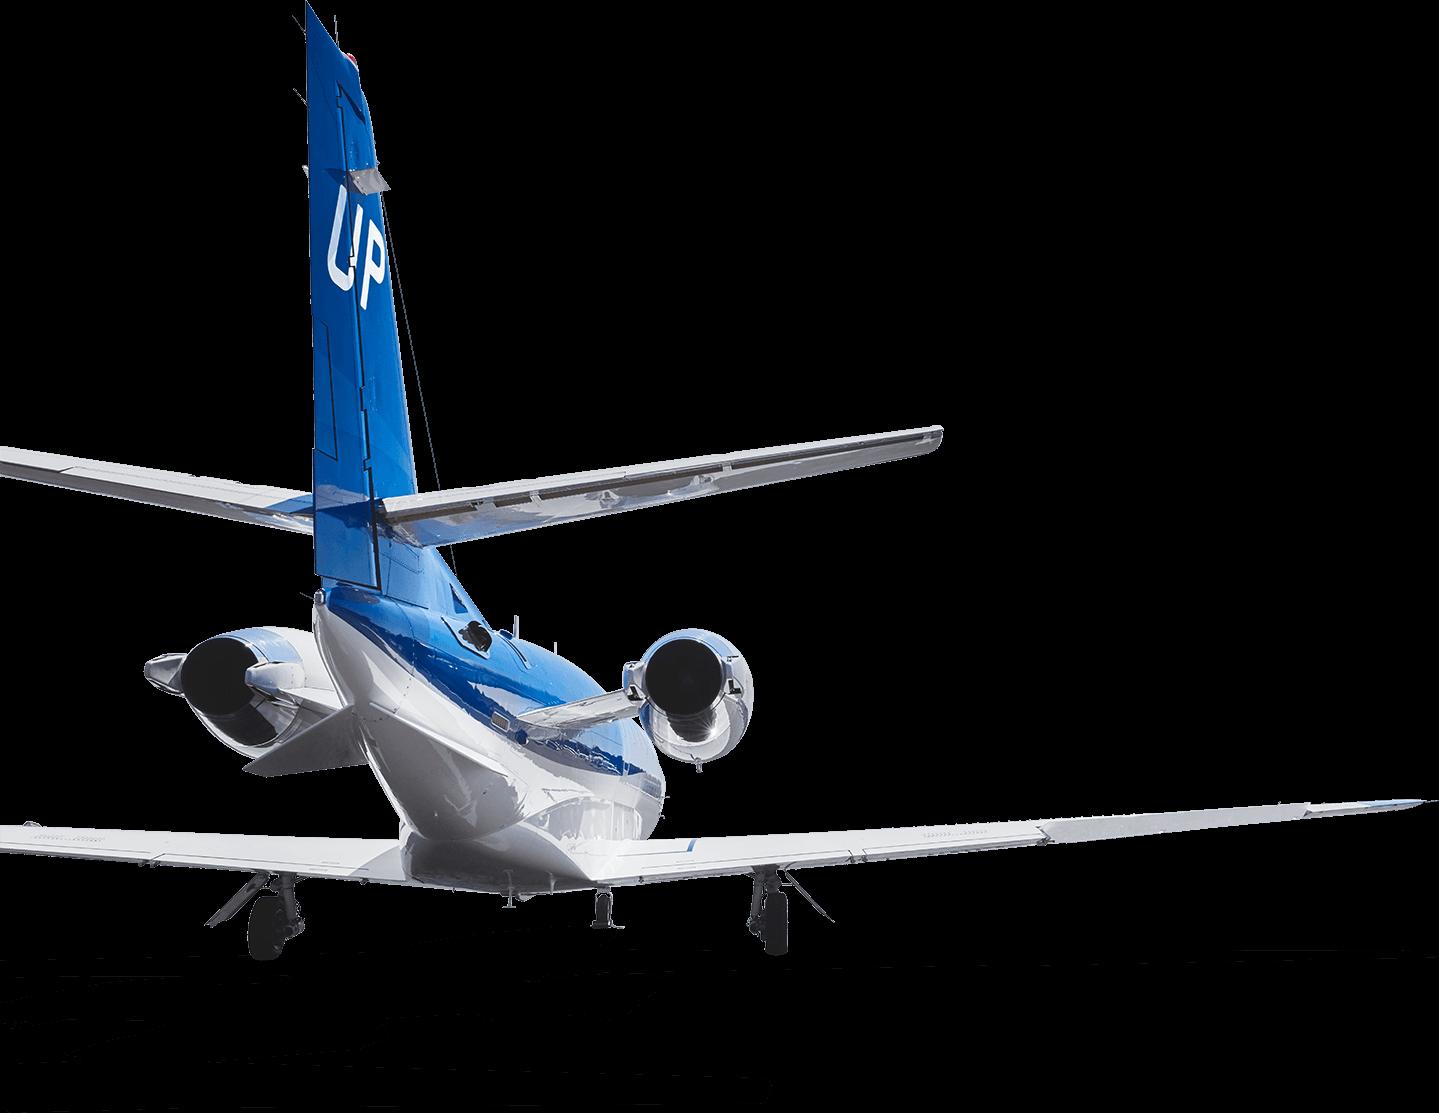 Wheels Up A Private Jet Charter Flight Membership Company